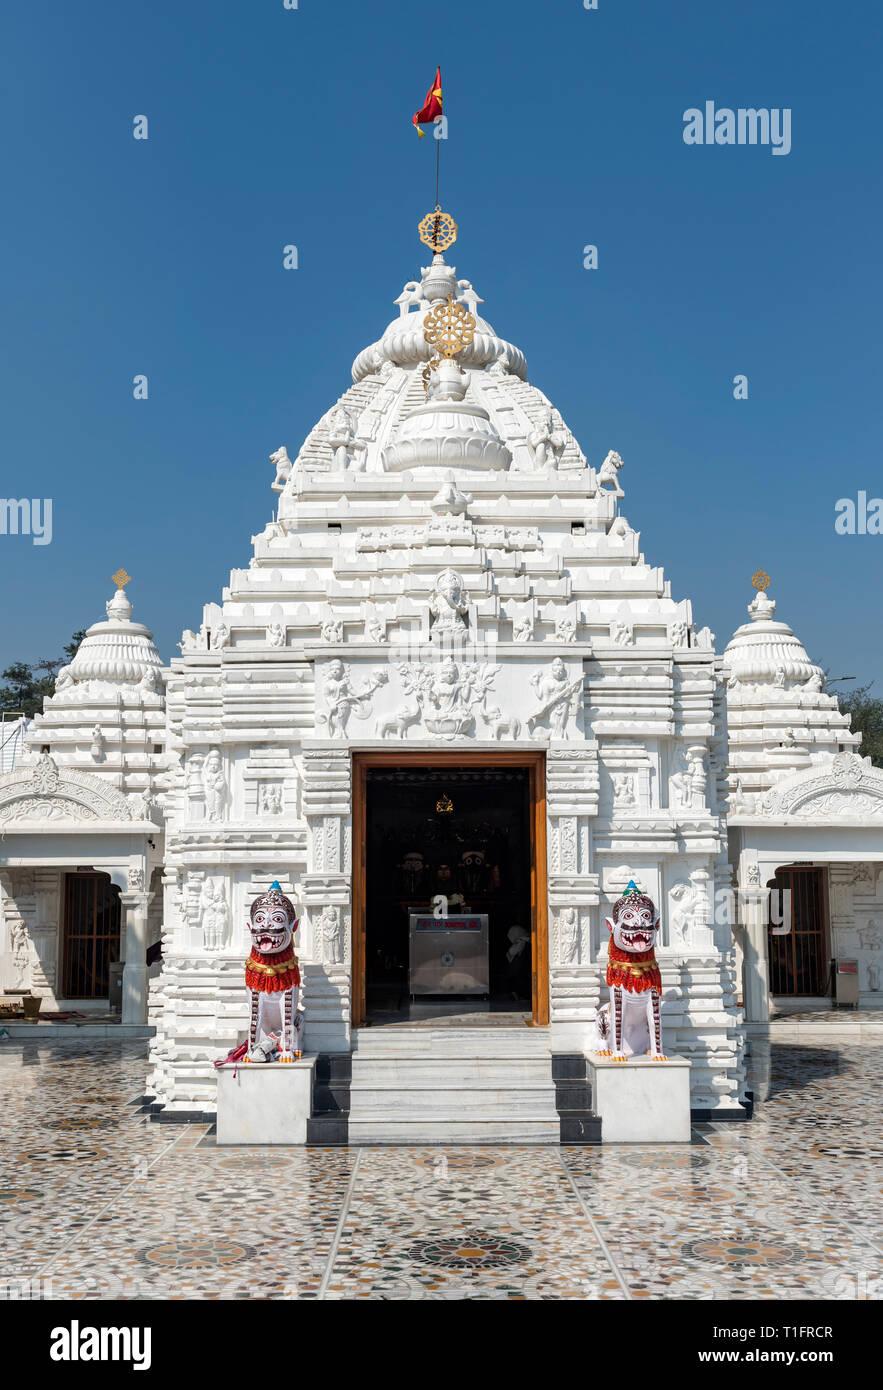 Shree Neelachala Seva Sangha Jagannath Temple, Hauz Khas, South Delhi, India - Stock Image